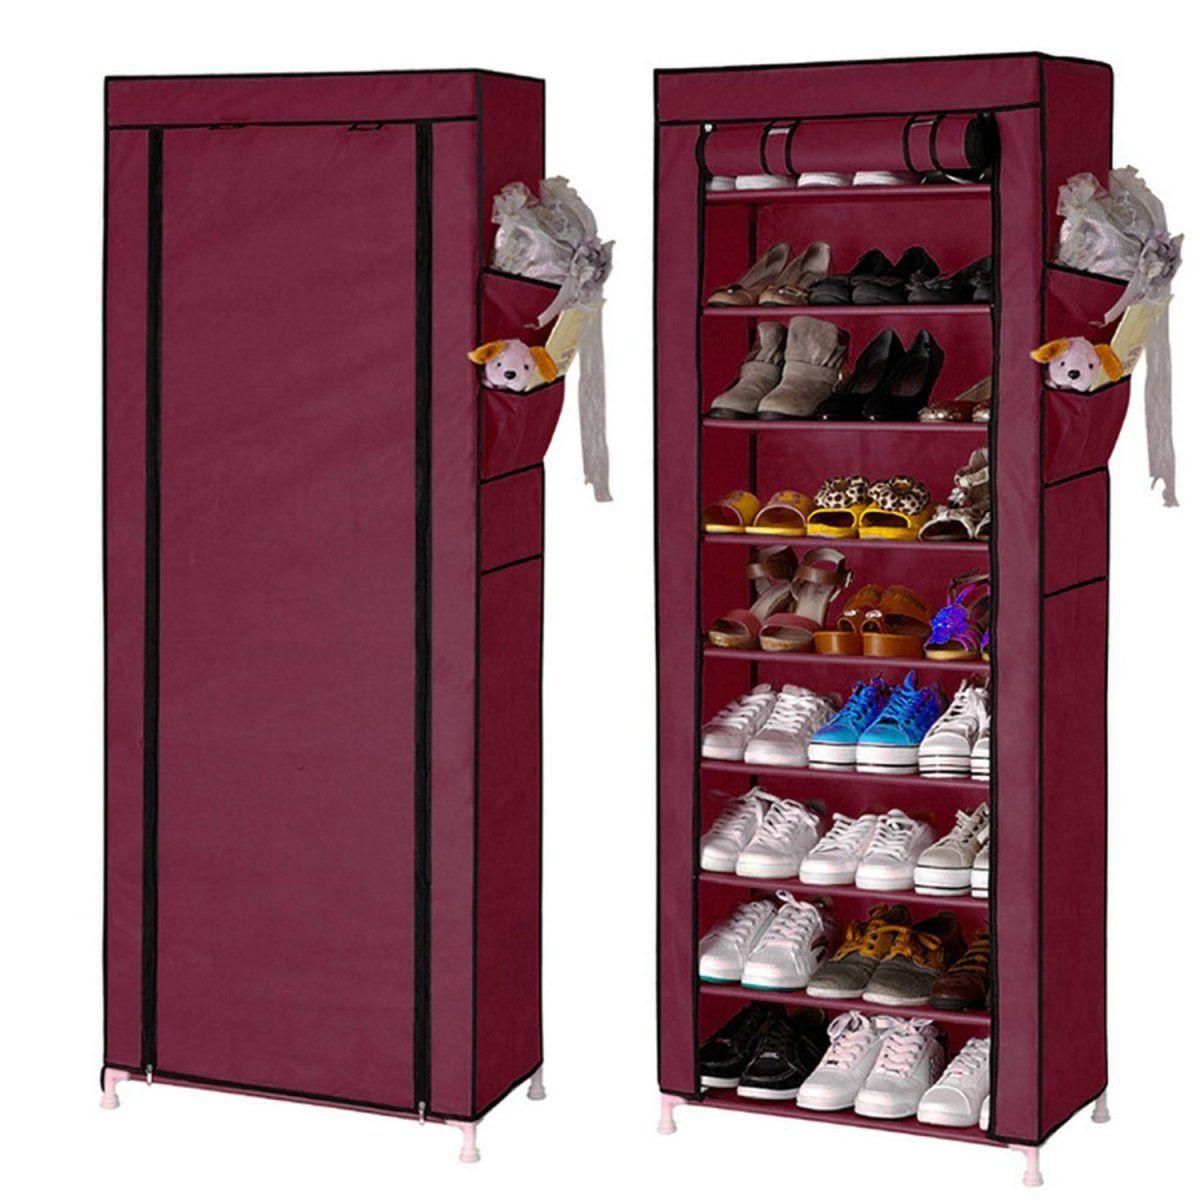 Shoe Rack Closet Portable Shoe Tower Storage Organizer Cabinet $14.37